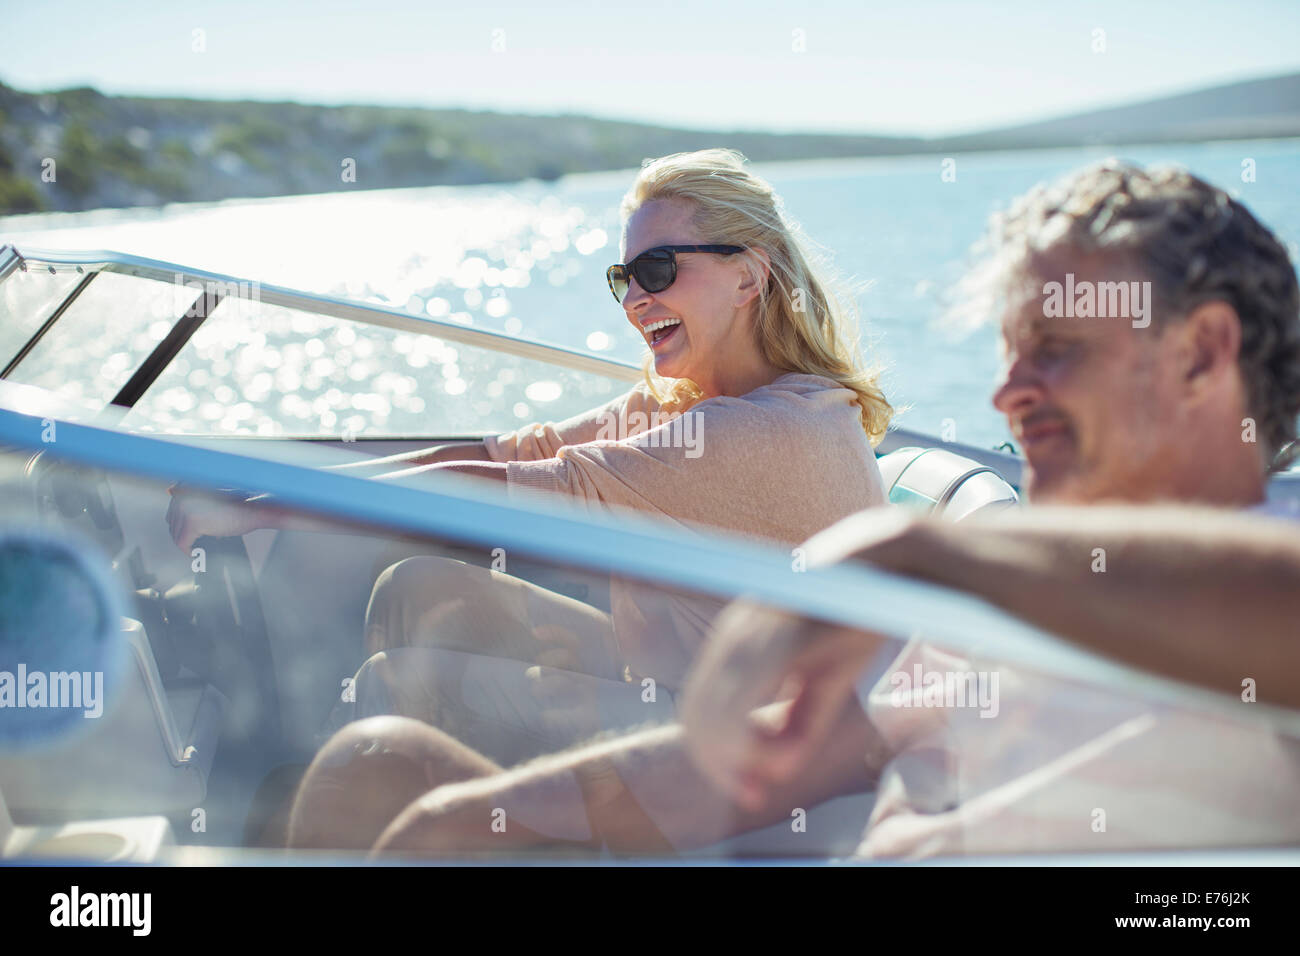 Par de conducción de agua en barco Imagen De Stock